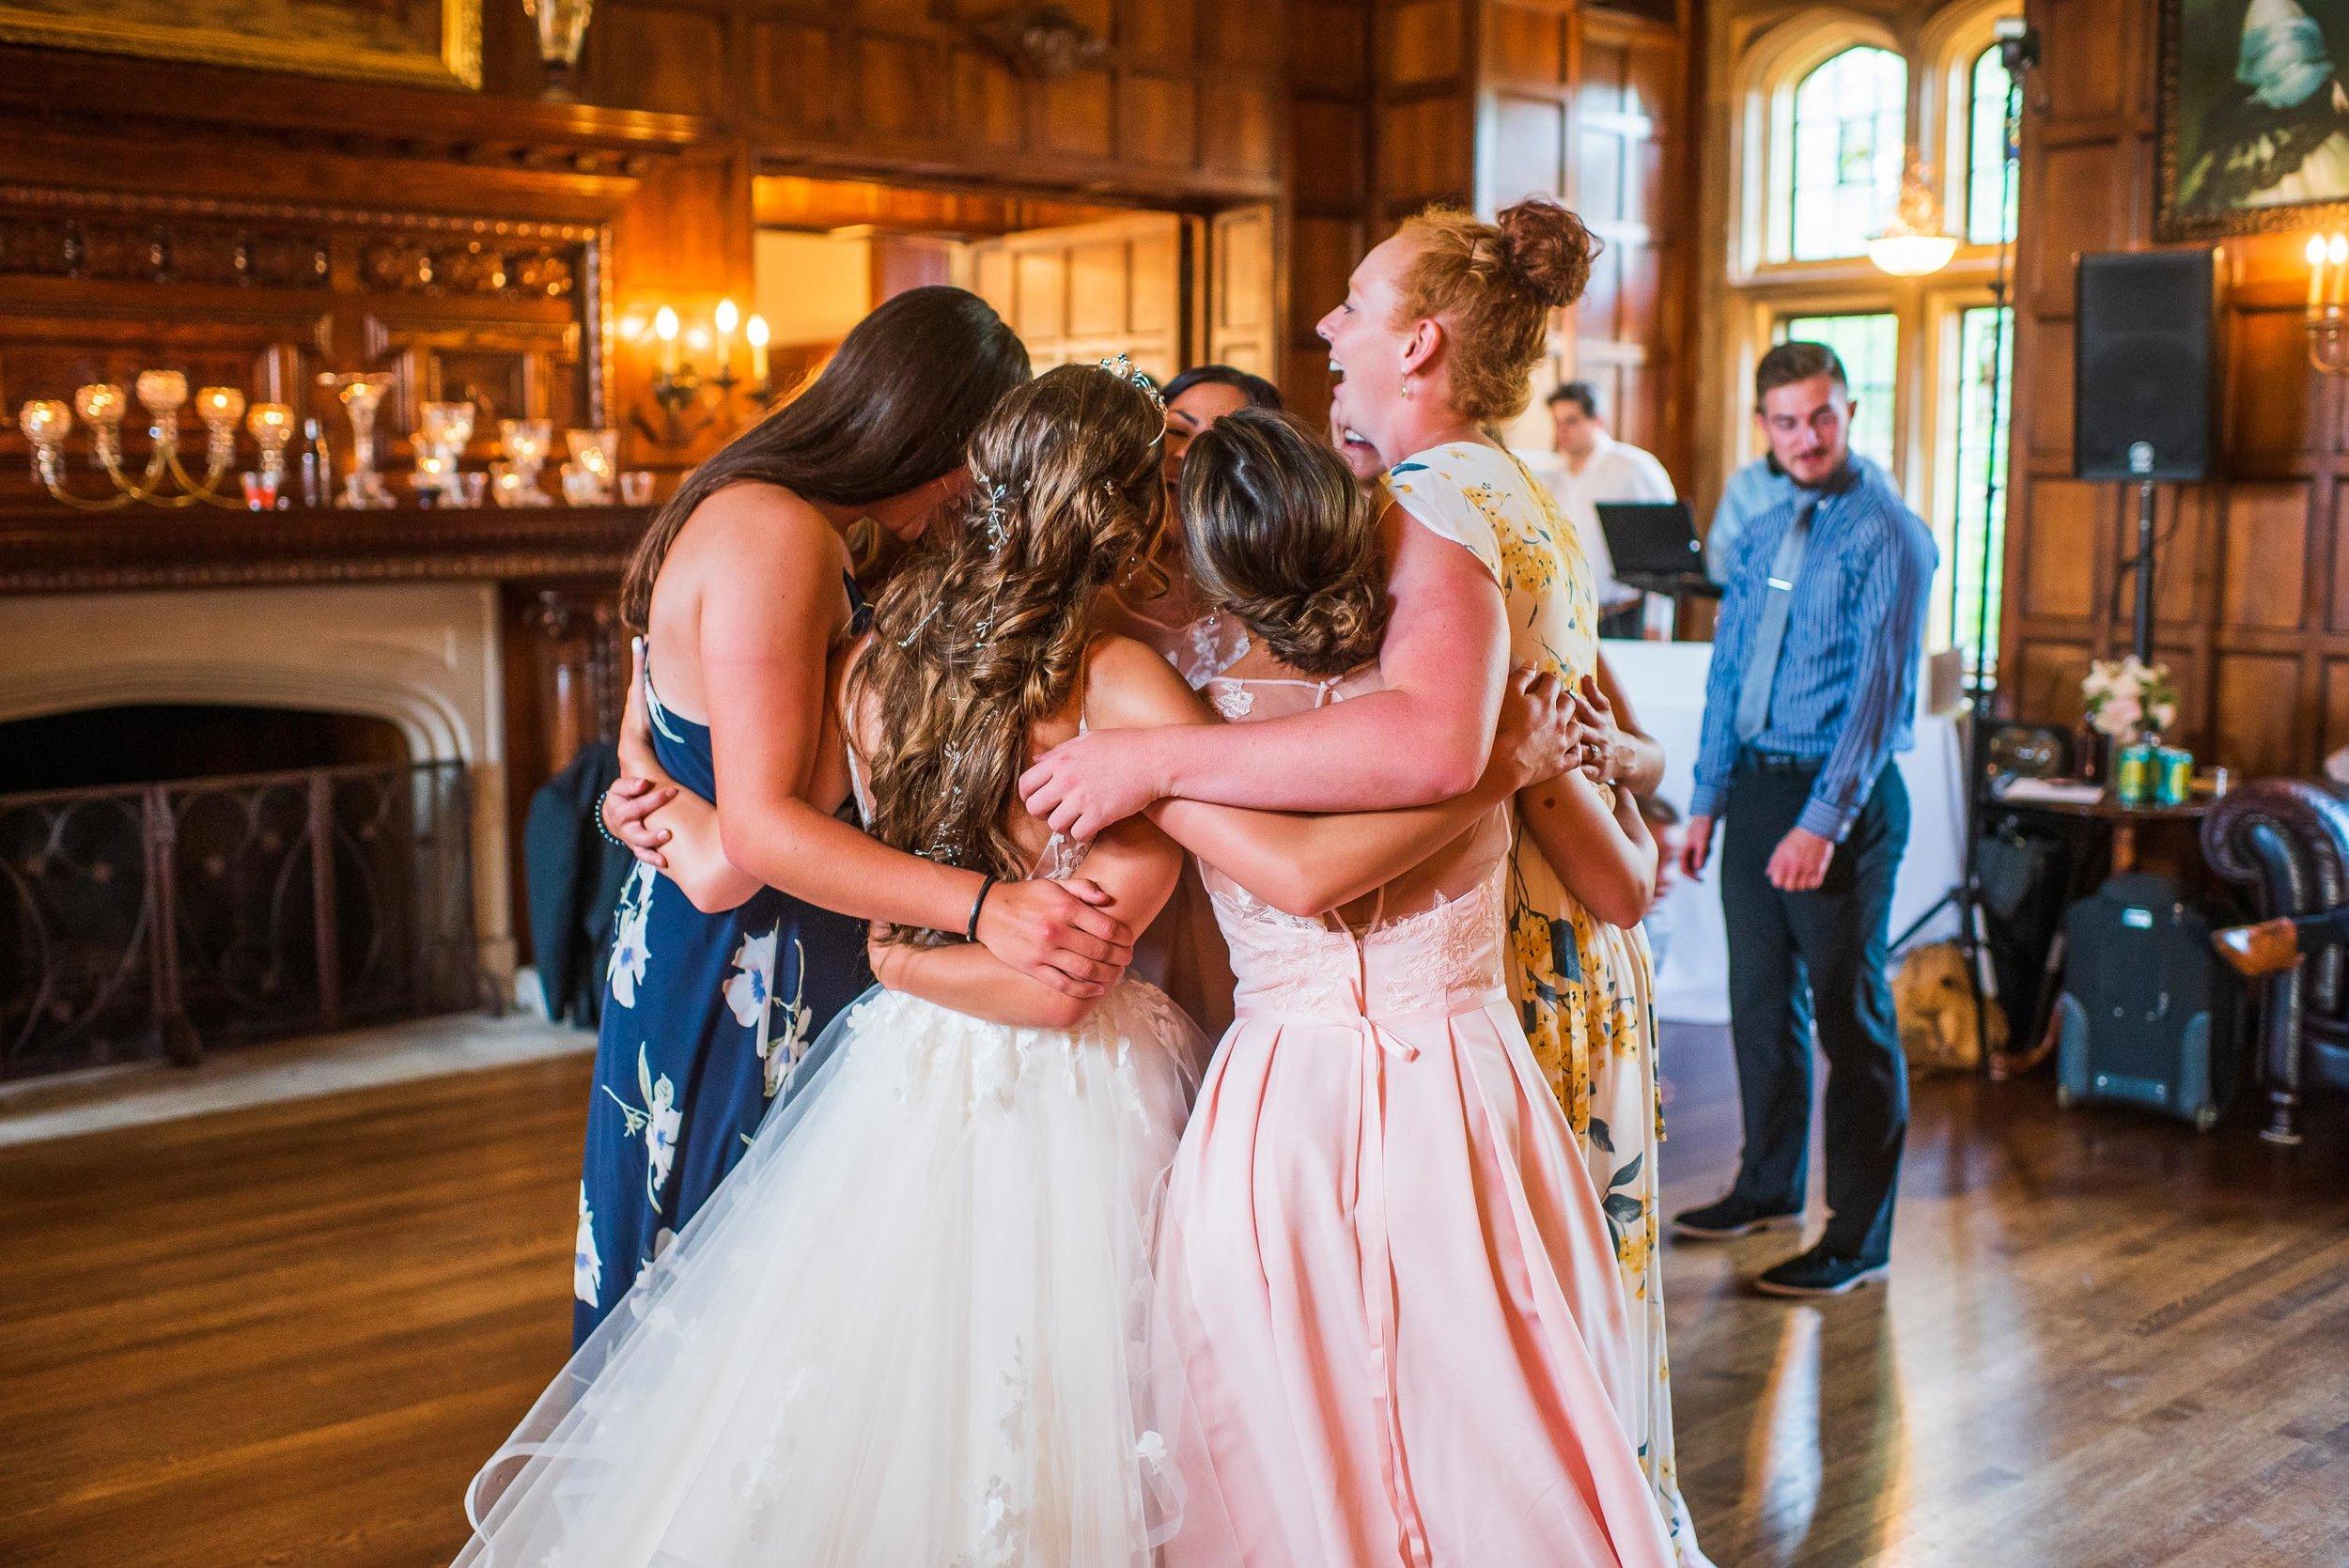 thornewood castle wedding 74.jpg